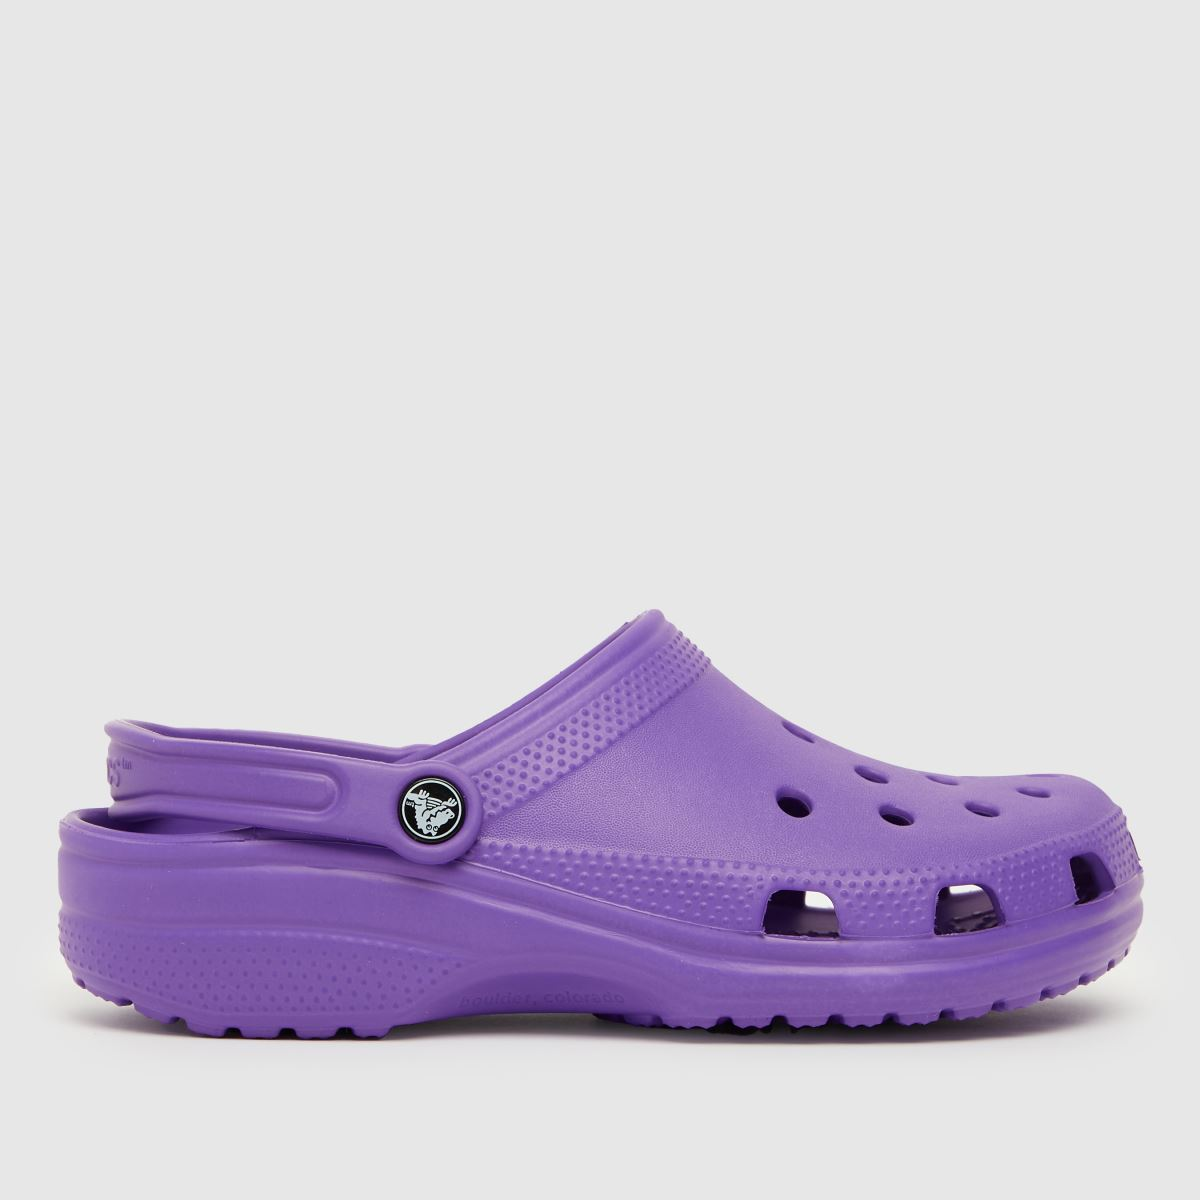 Crocs Purple Classic Sandal Sandals